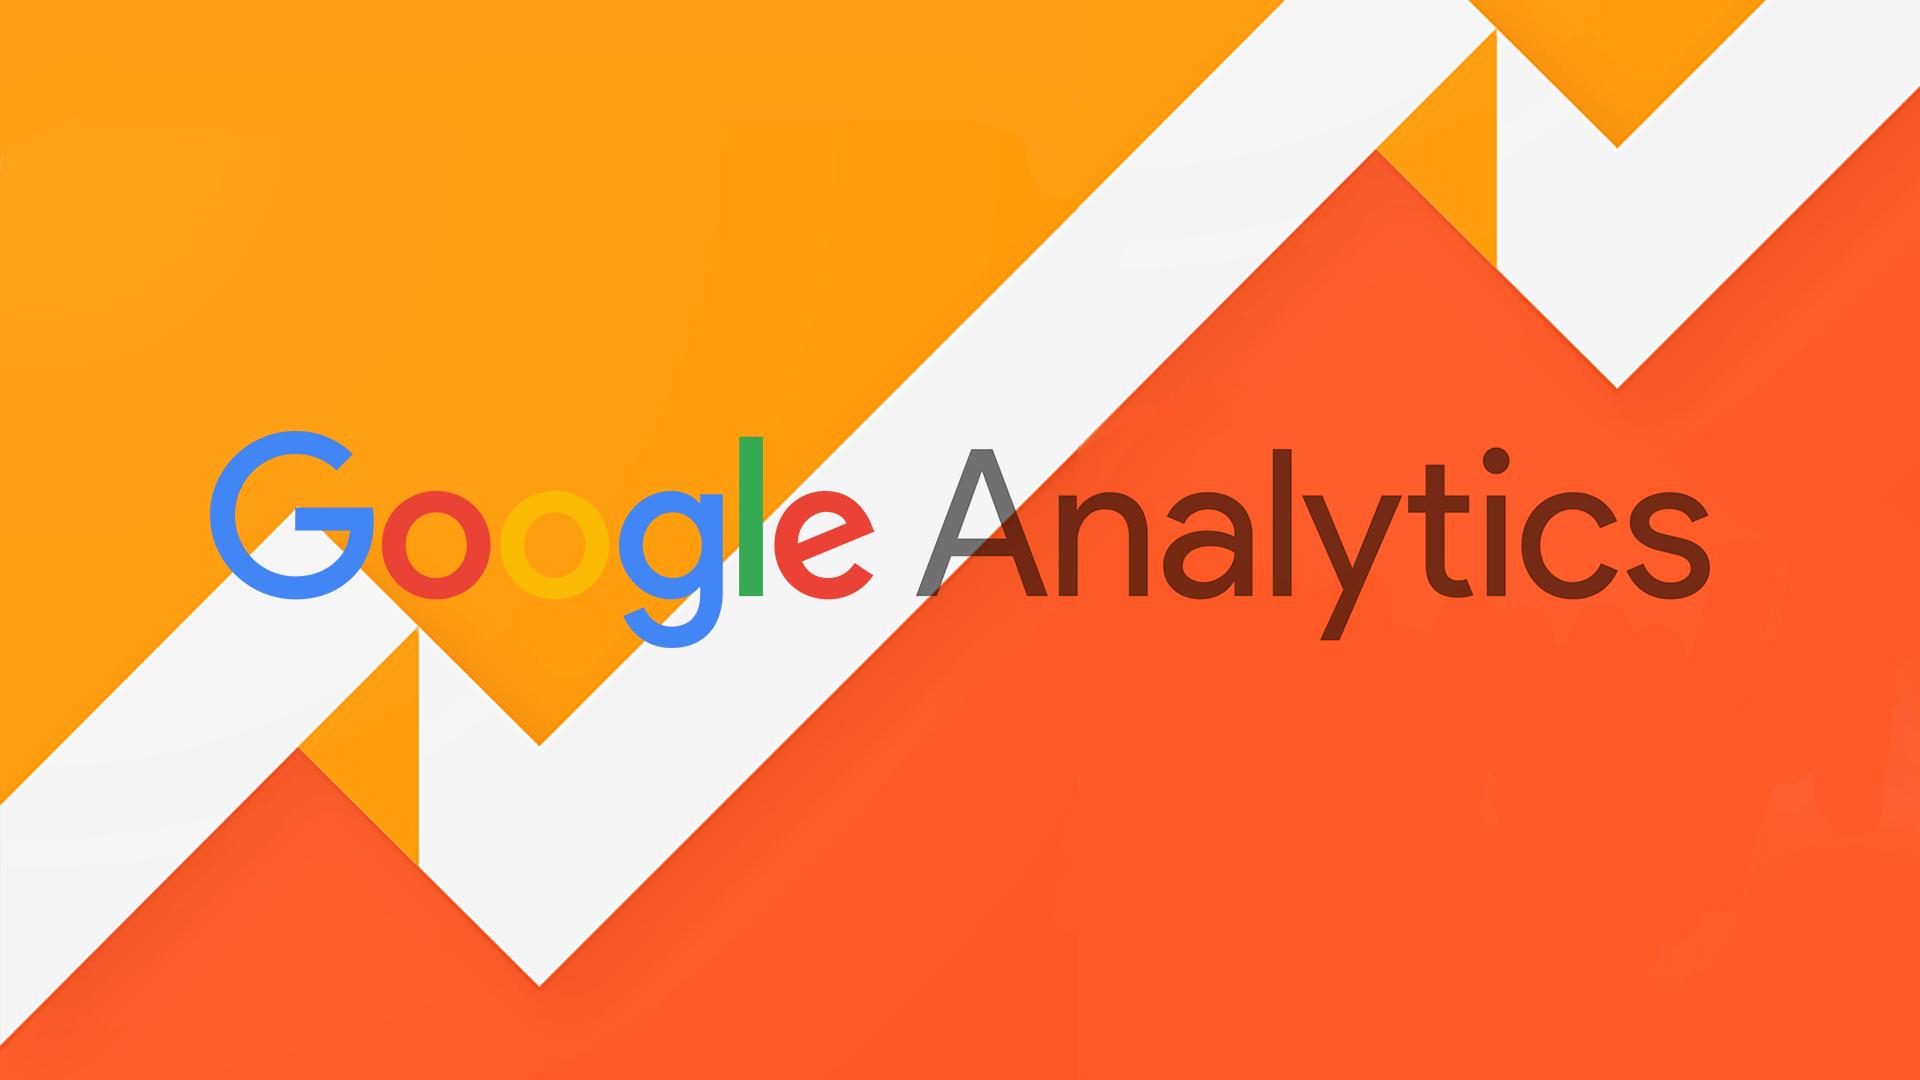 Google Analytic Delivery Platform